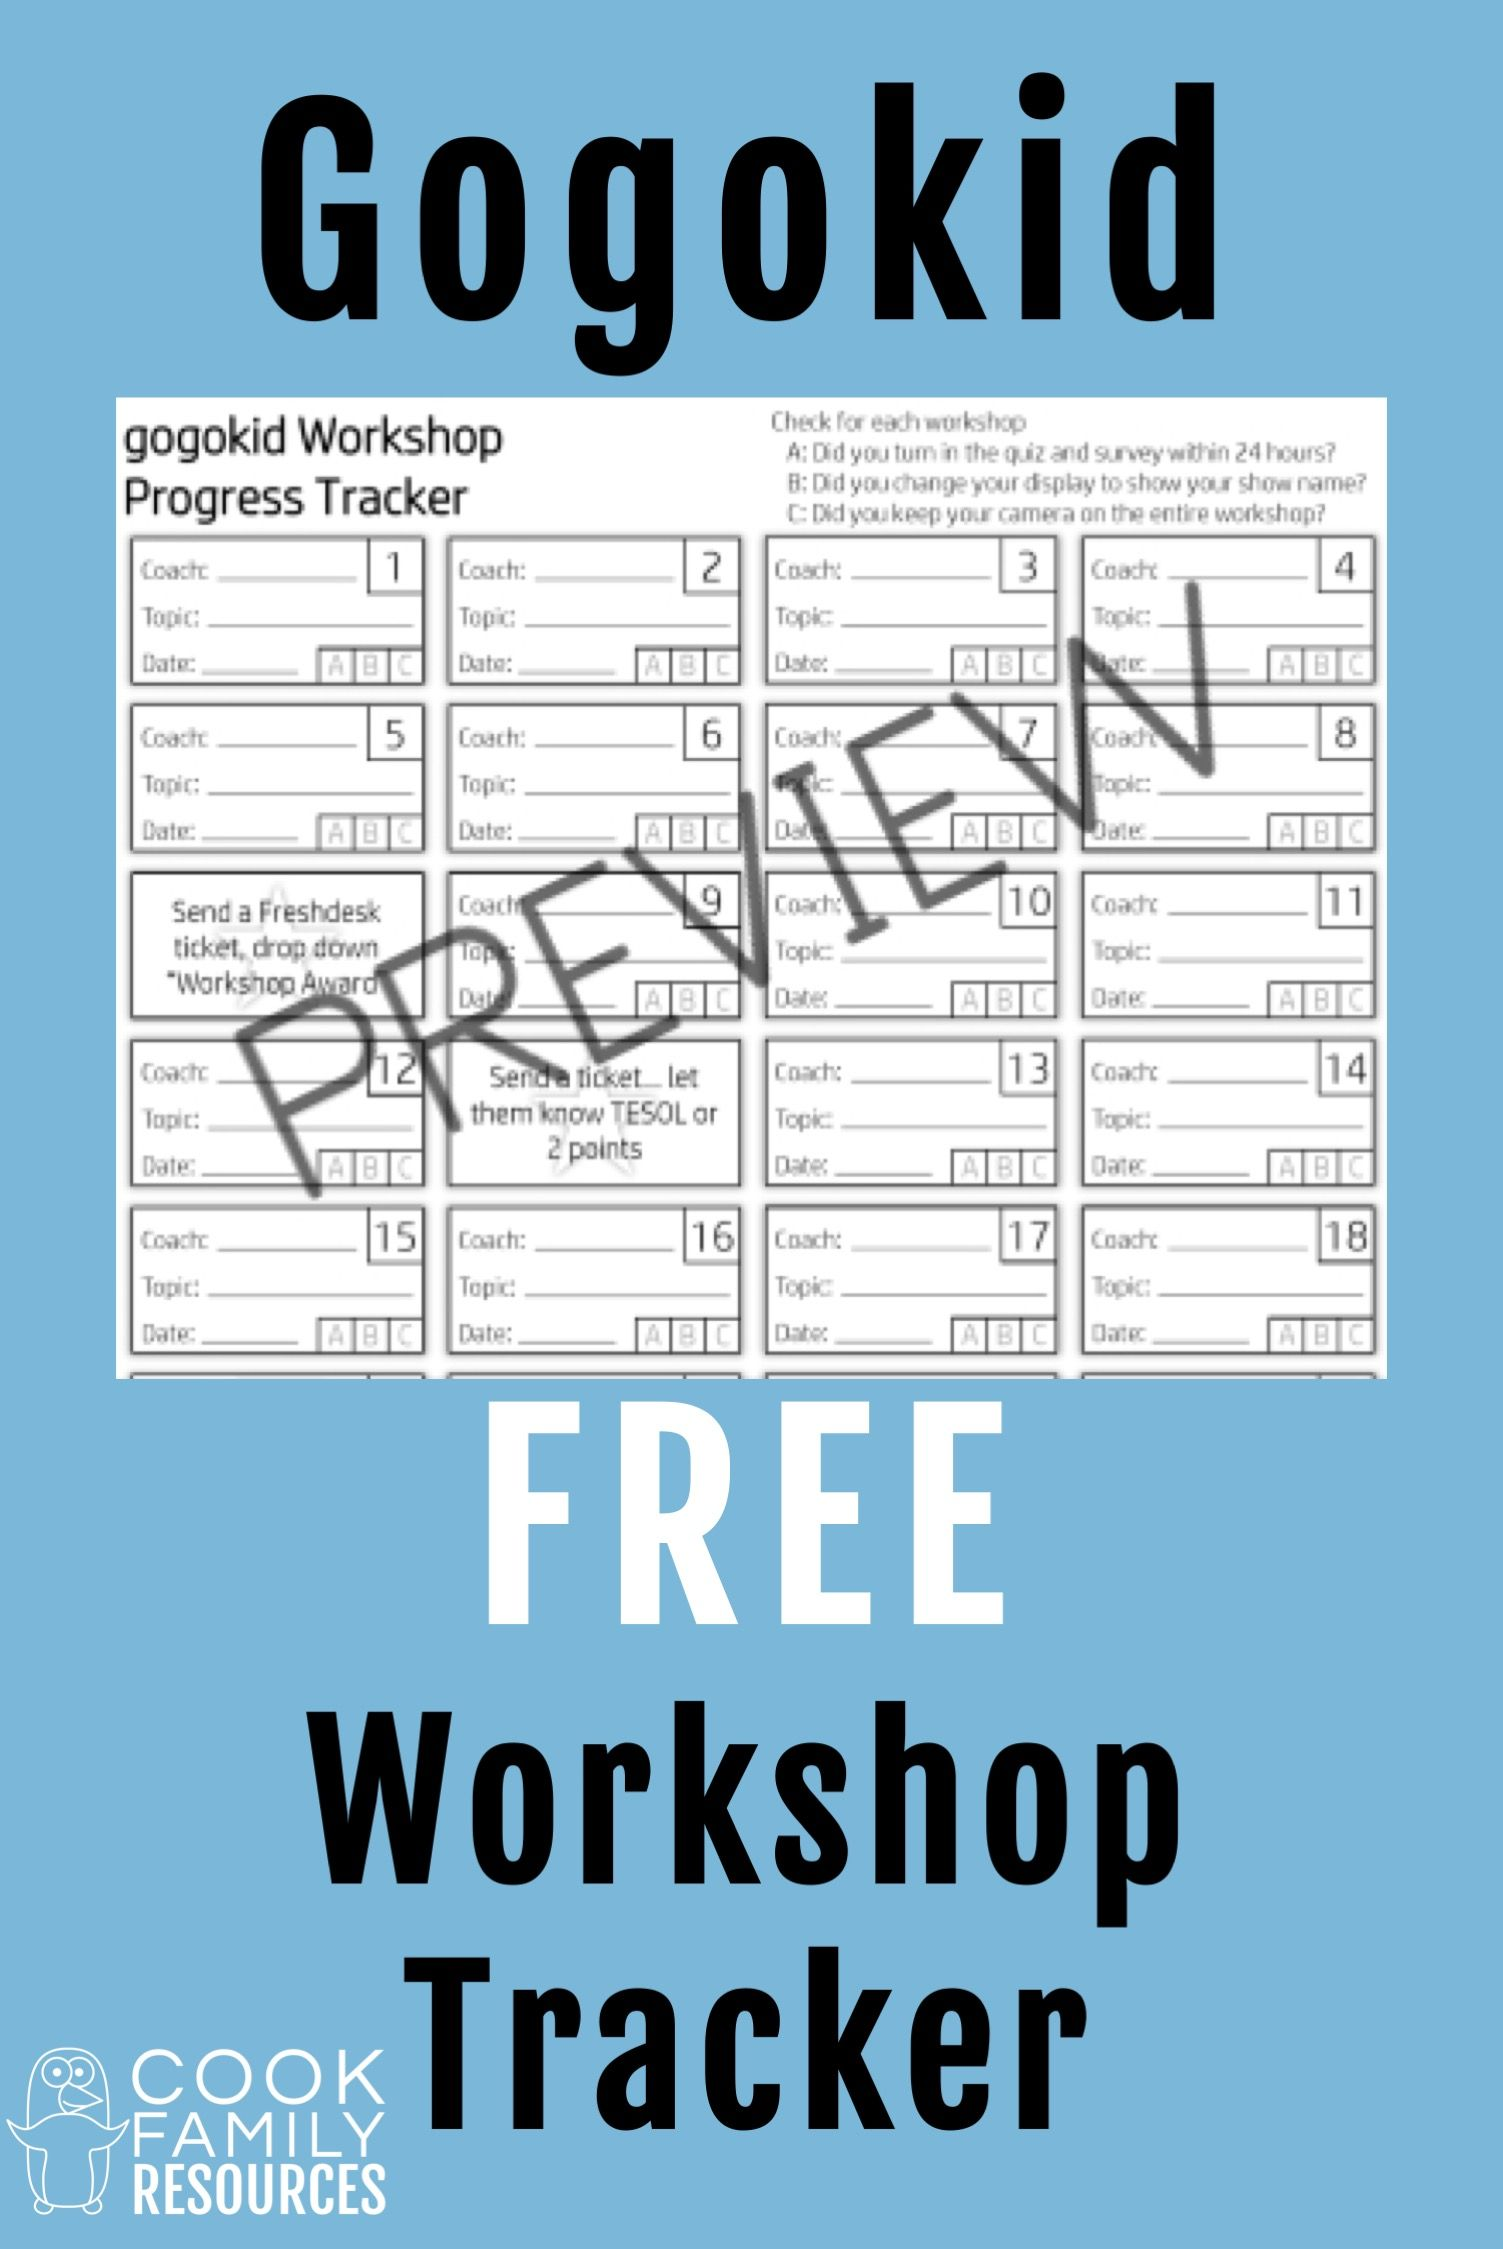 Gogokid Workshop Progress Tracker